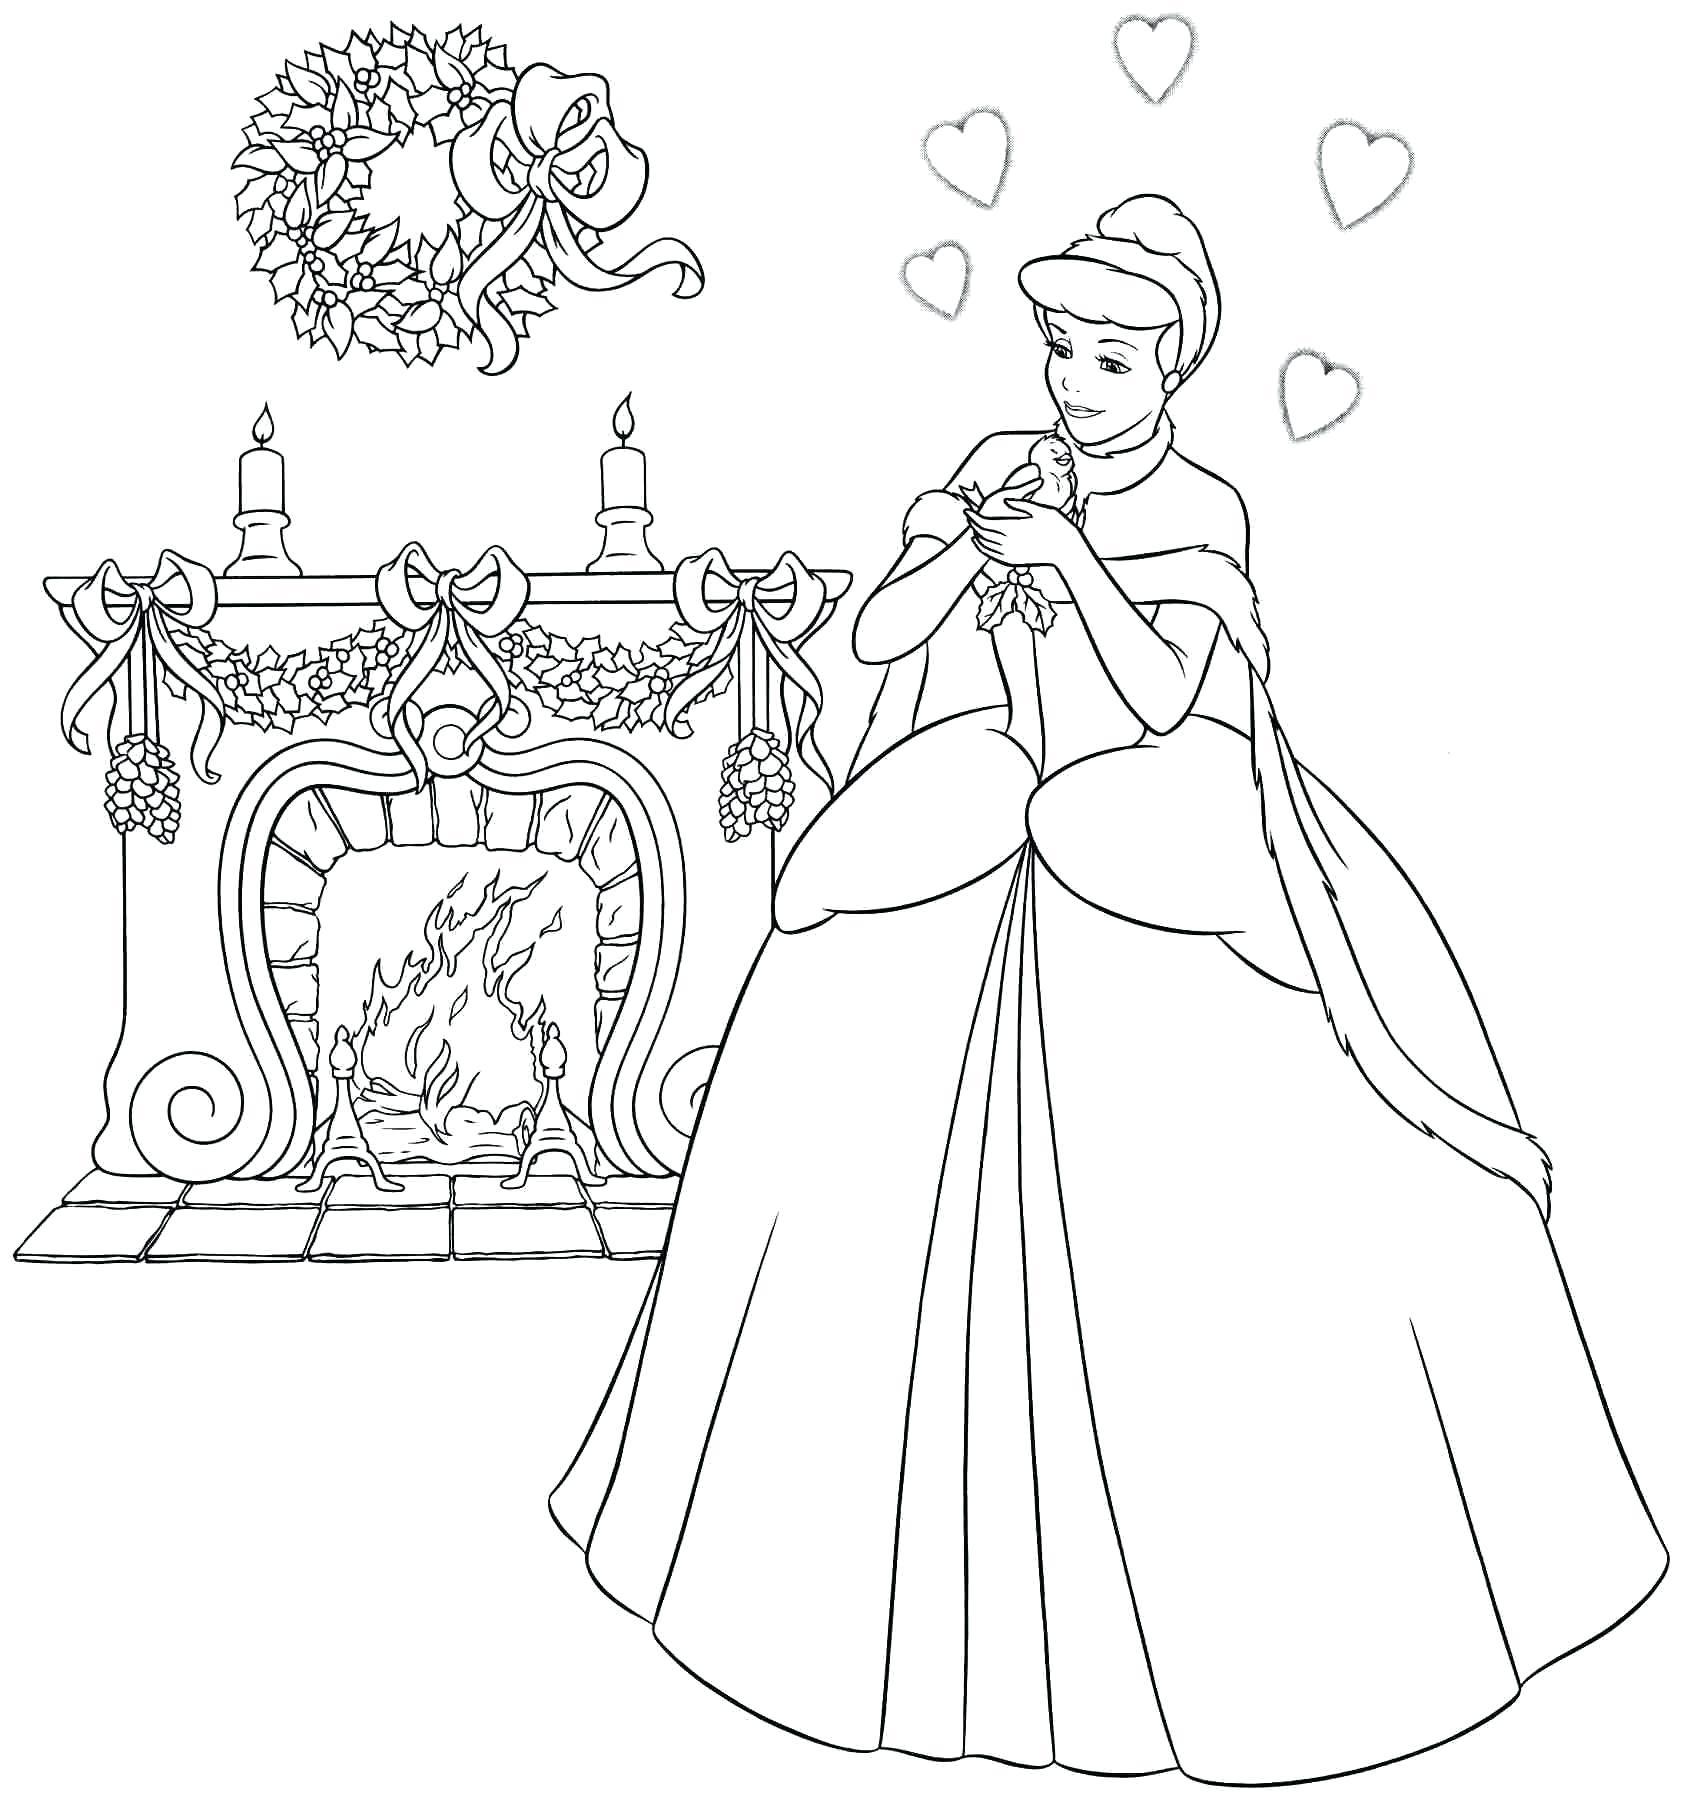 Cinderella Disney Coloring Pages At GetDrawings